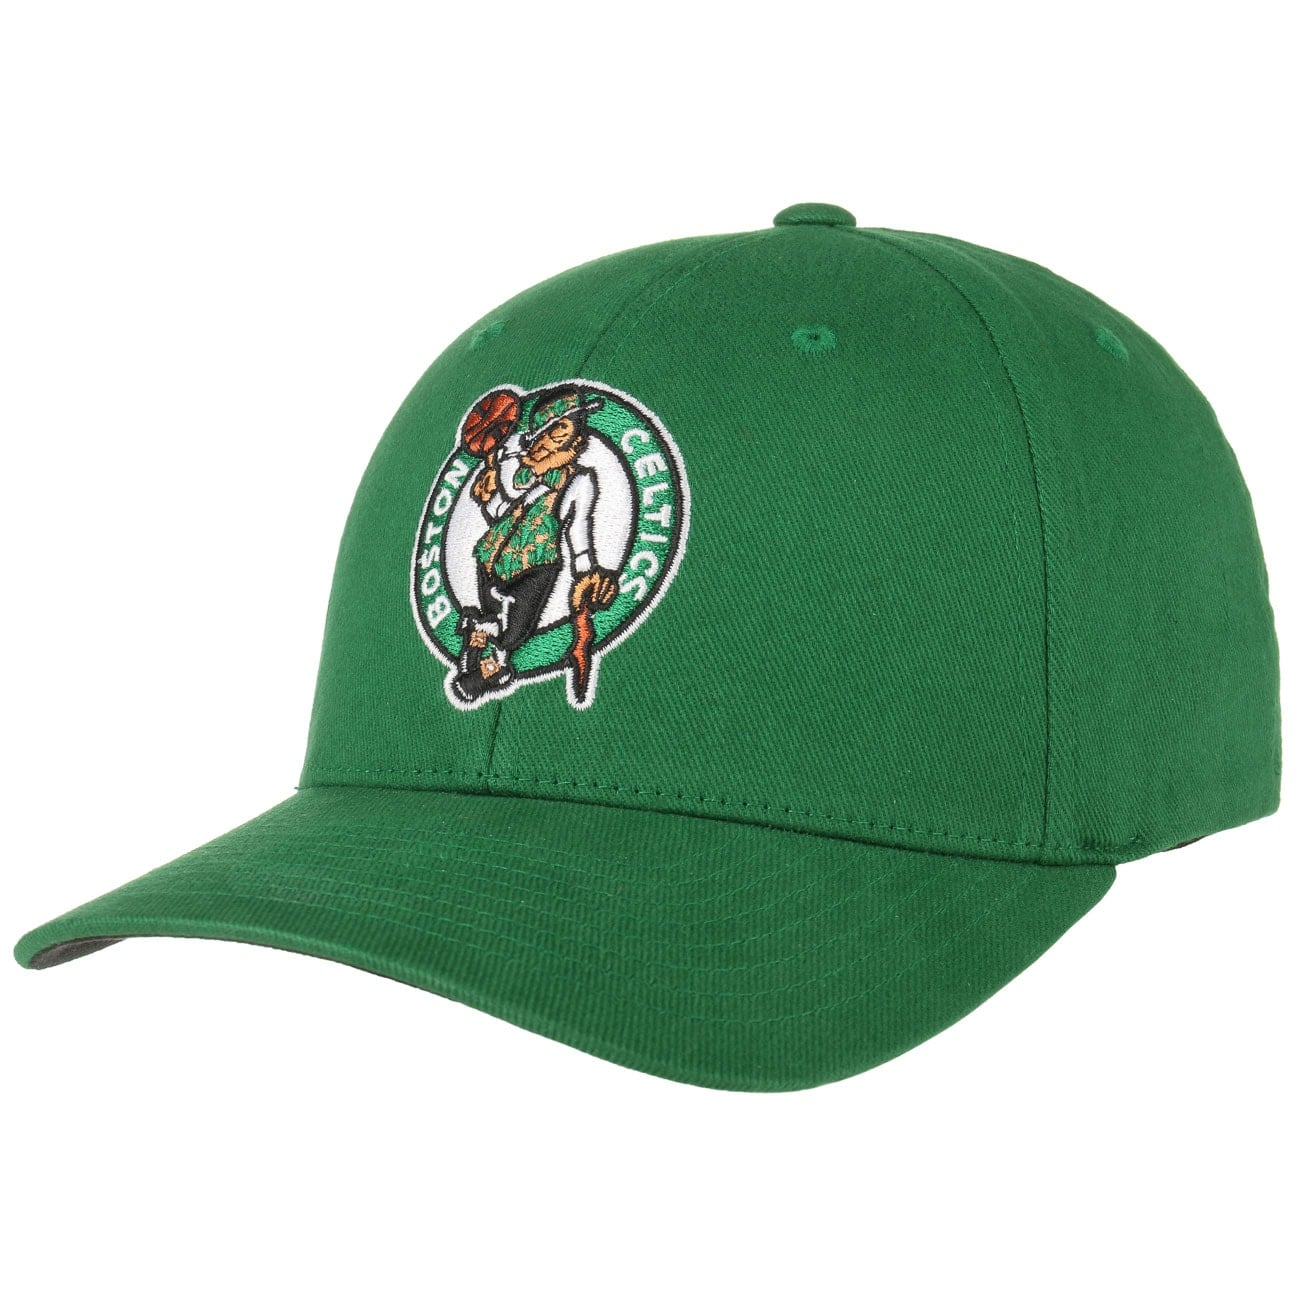 Gorra 110 Team Celtics by Mitchell & Ness